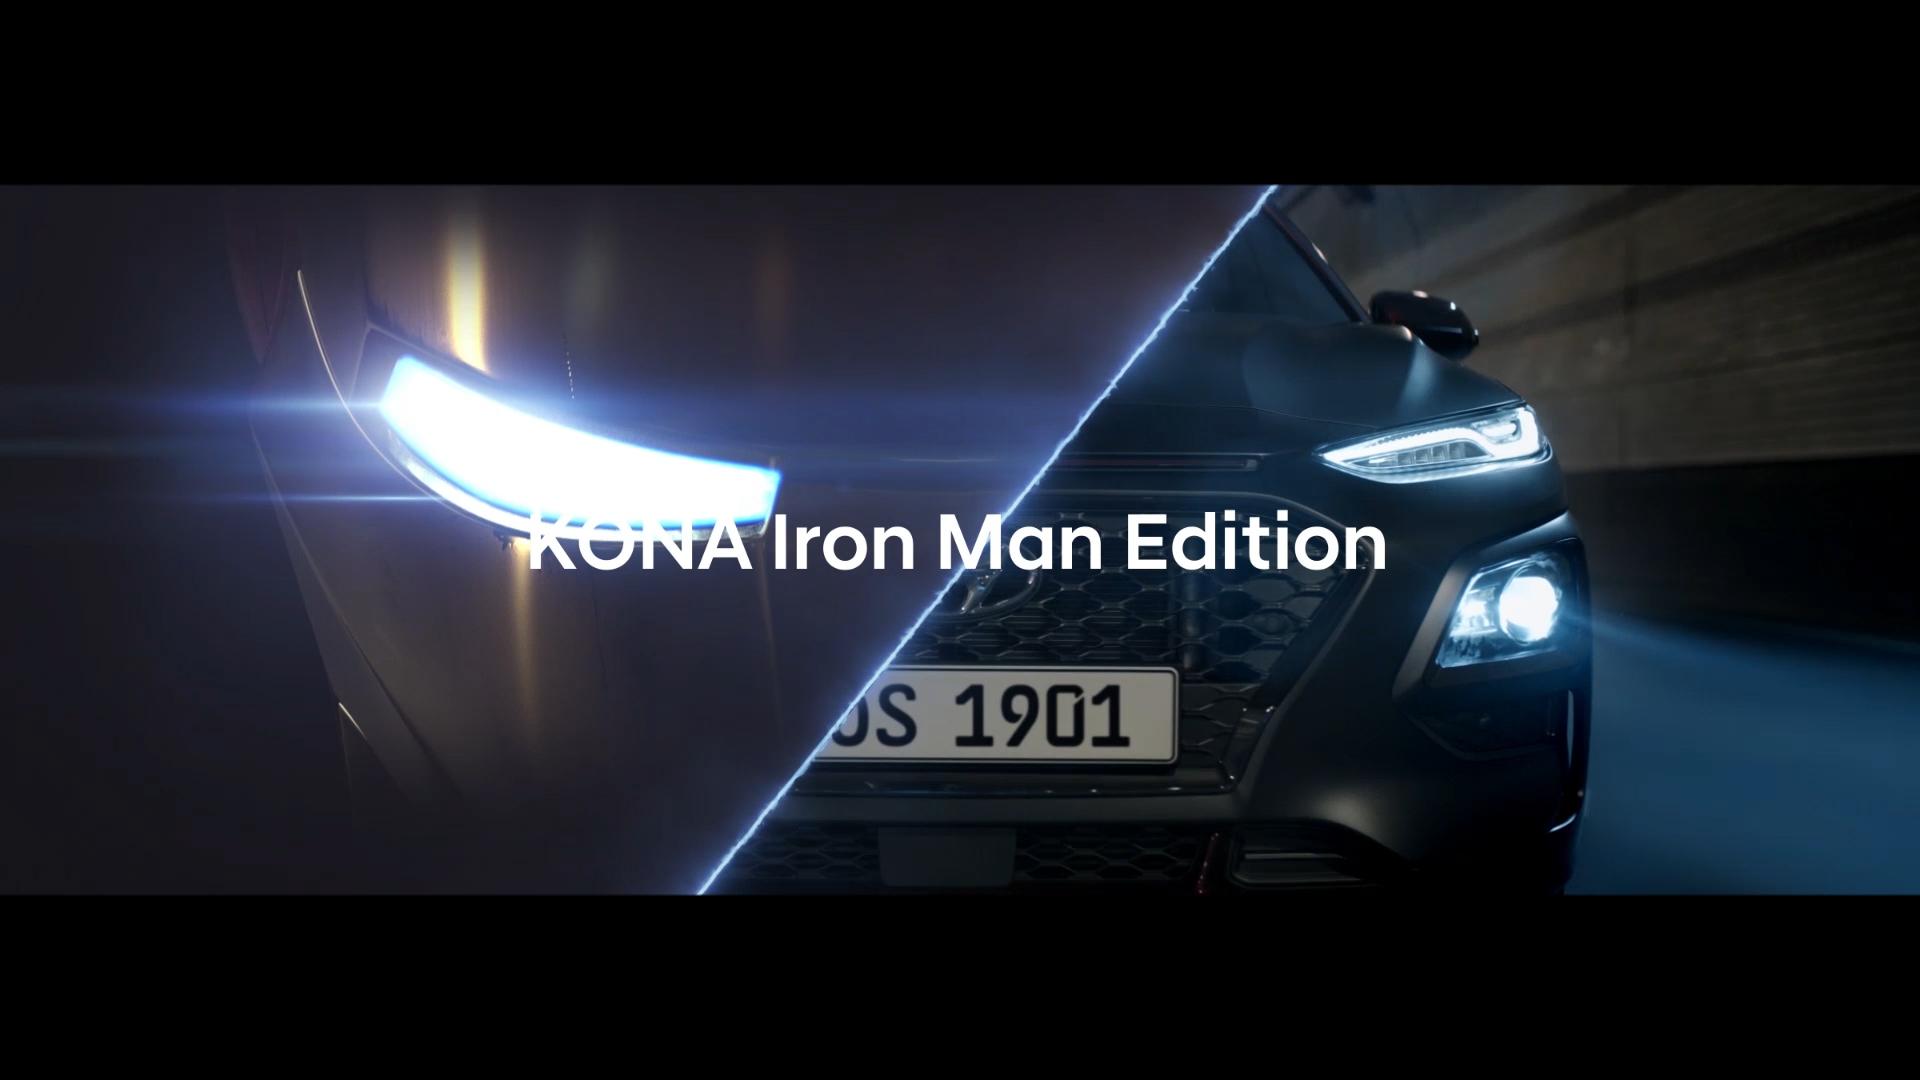 Kona_IronMan_Edition